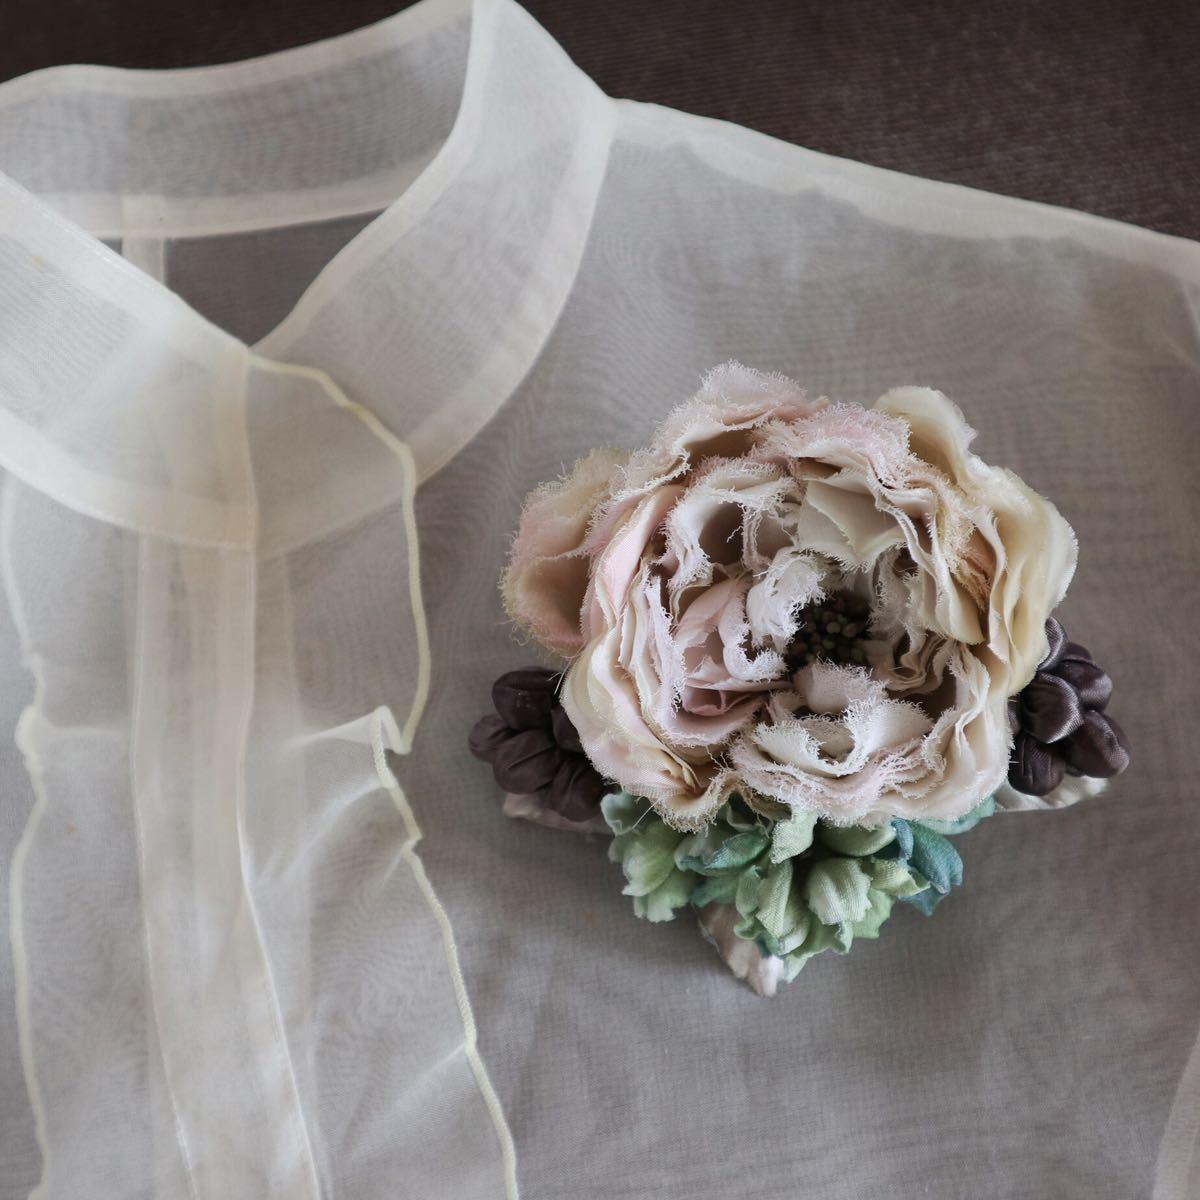 *kashun* ハンドメイド 布花のアンティークカラーのミニブーケ風コサージュ6 ピンクのバラとアジサイ /染花/卒園式/卒業式/入学式_画像1